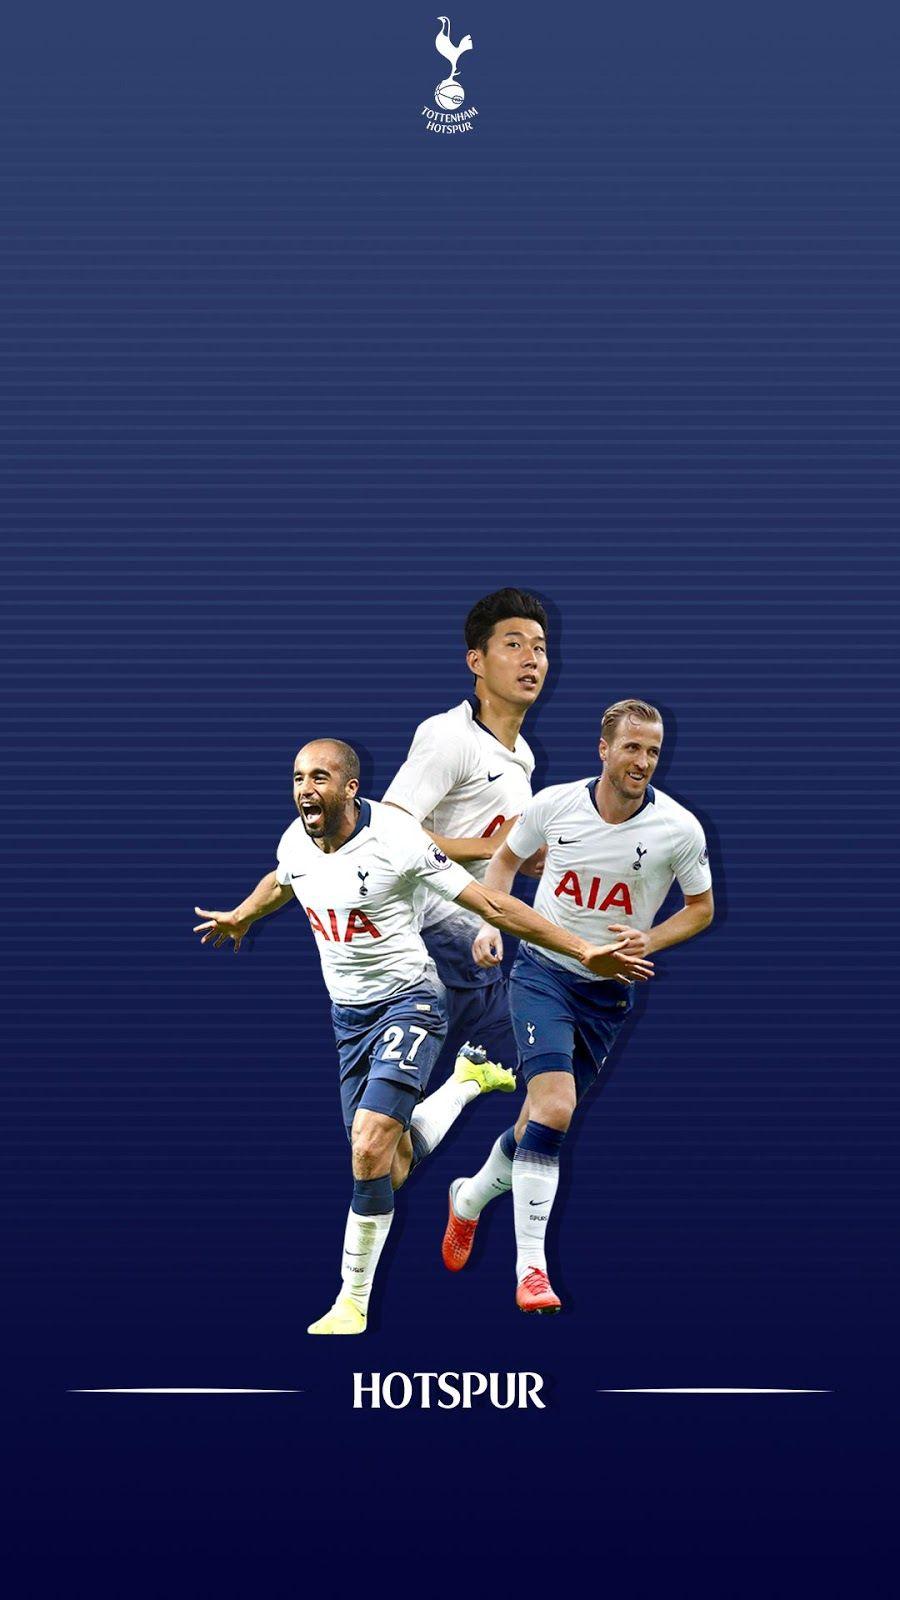 Tottenham Hotspur Iphone Wallpaper In 2020 Tottenham Hotspur Tottenham Hotspur Wallpaper Tottenham